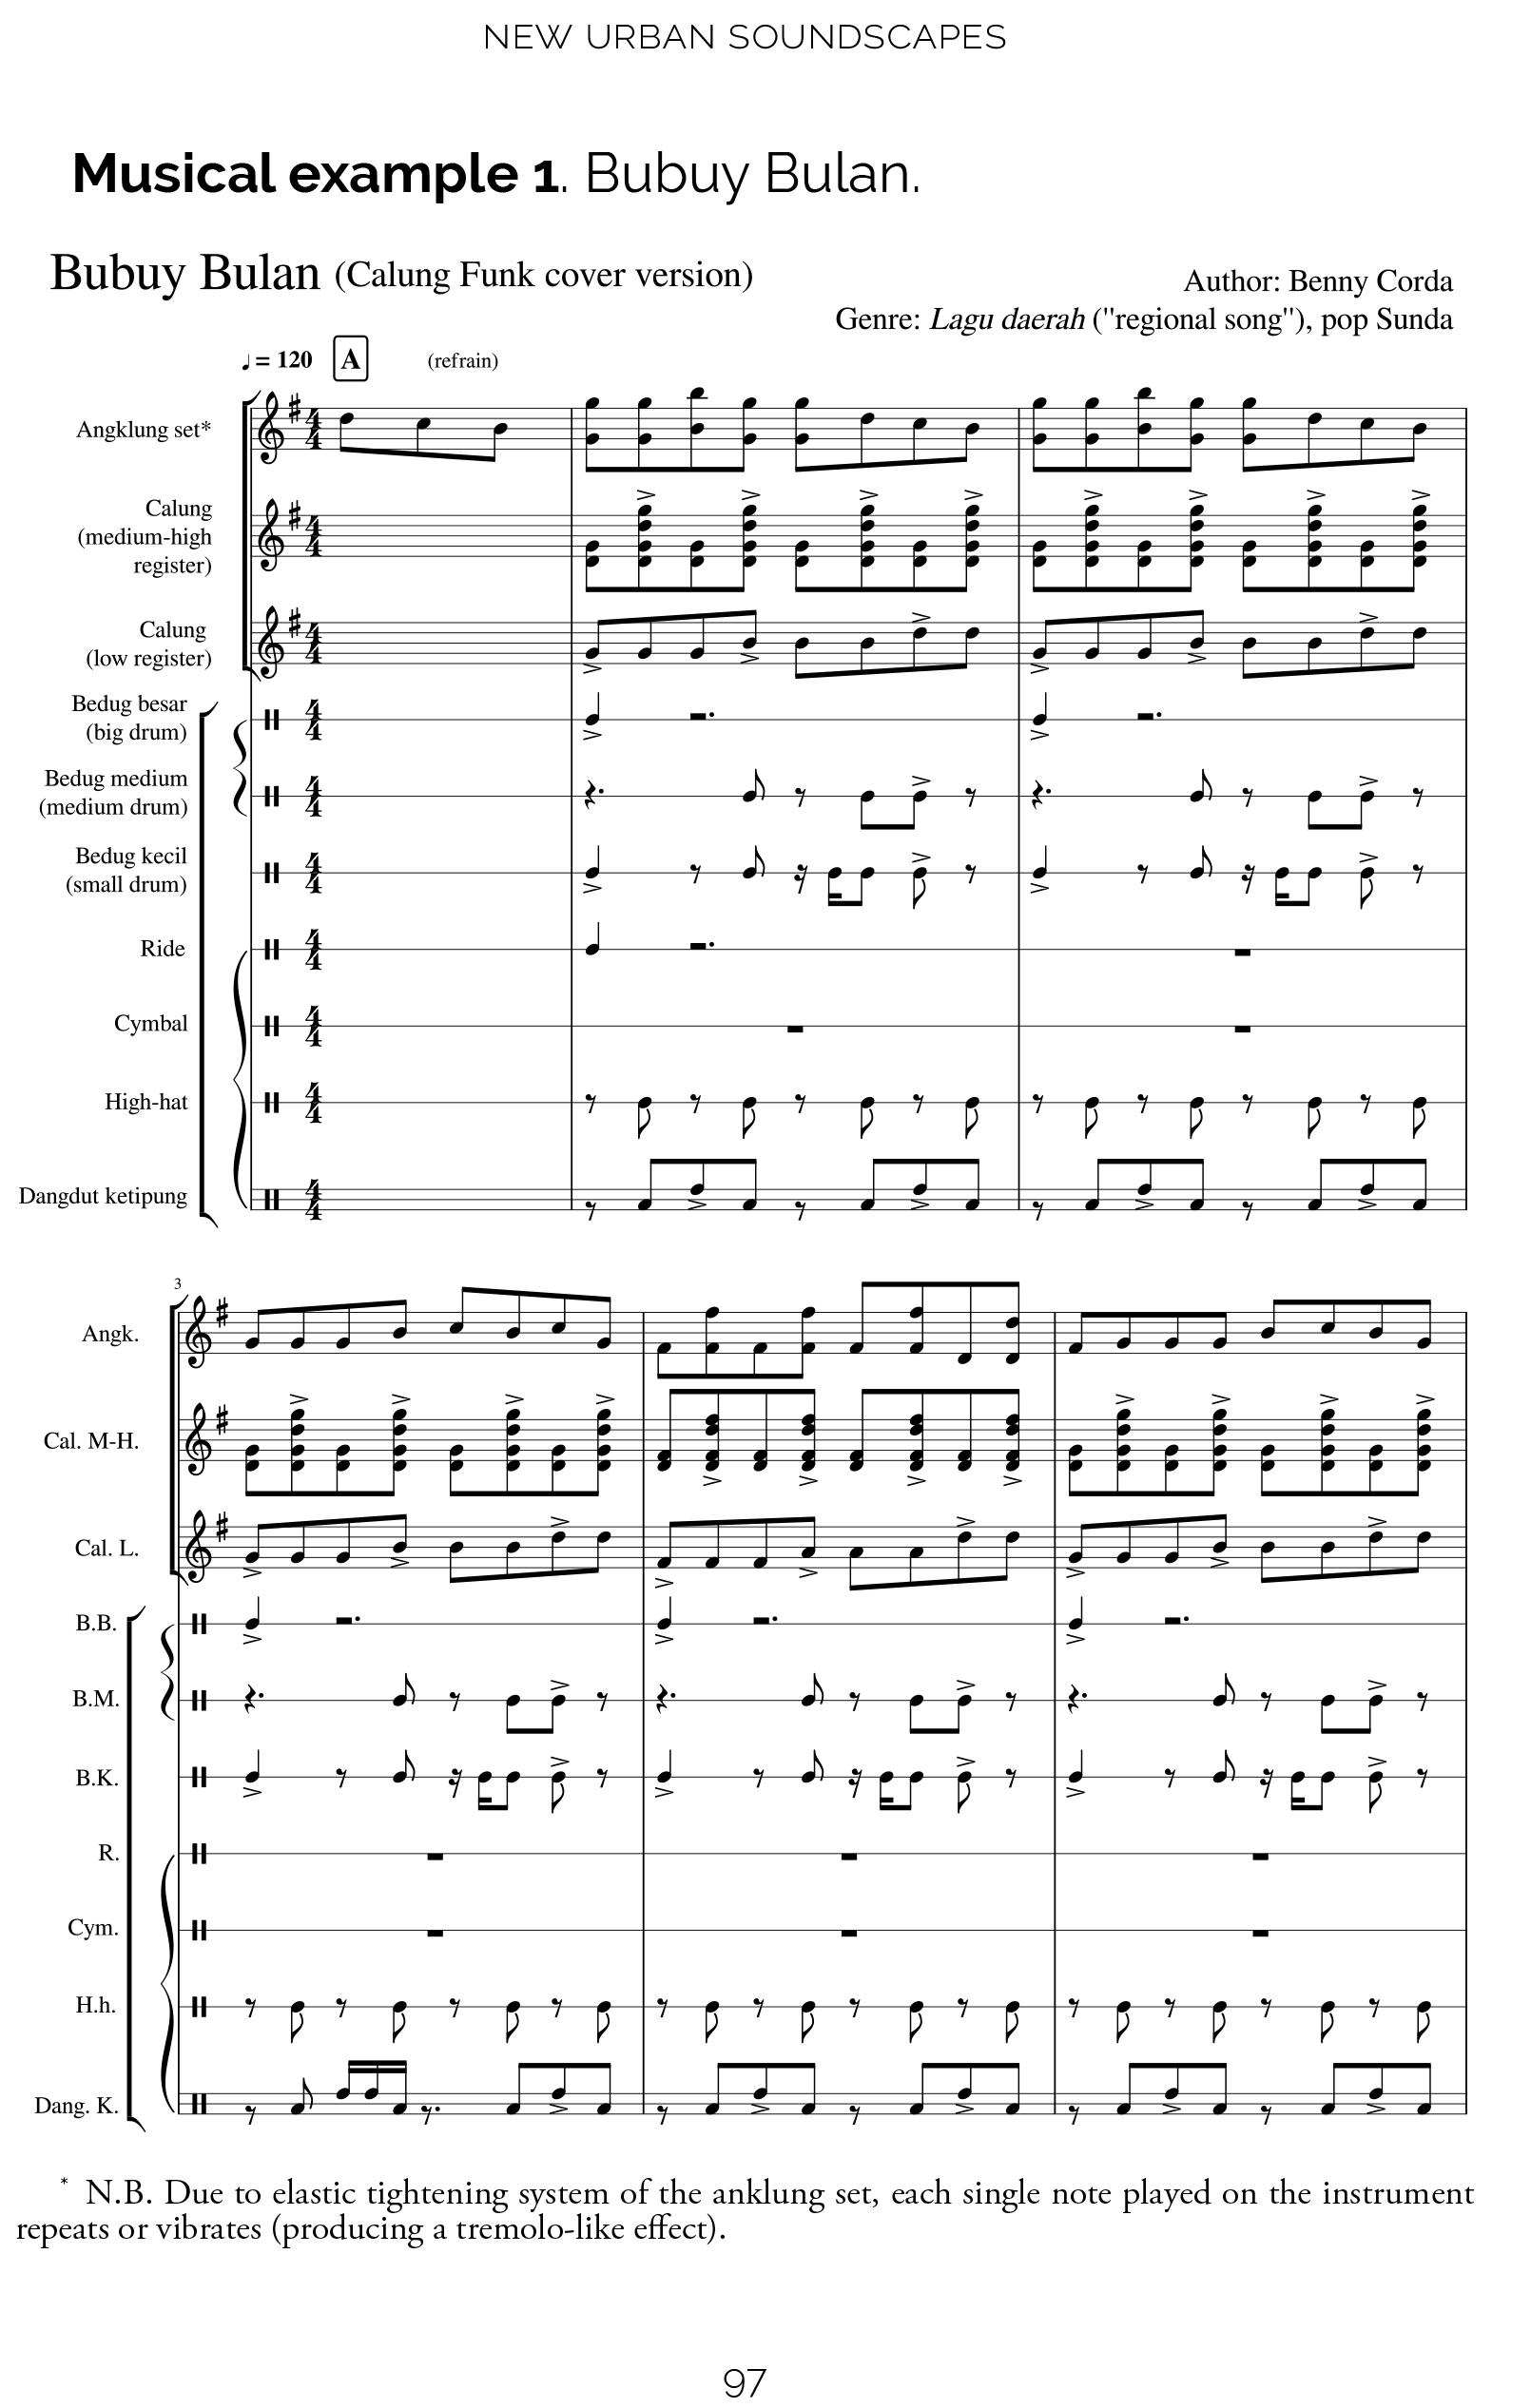 Musical Example 1. Bubuy Bulan Pagina 1